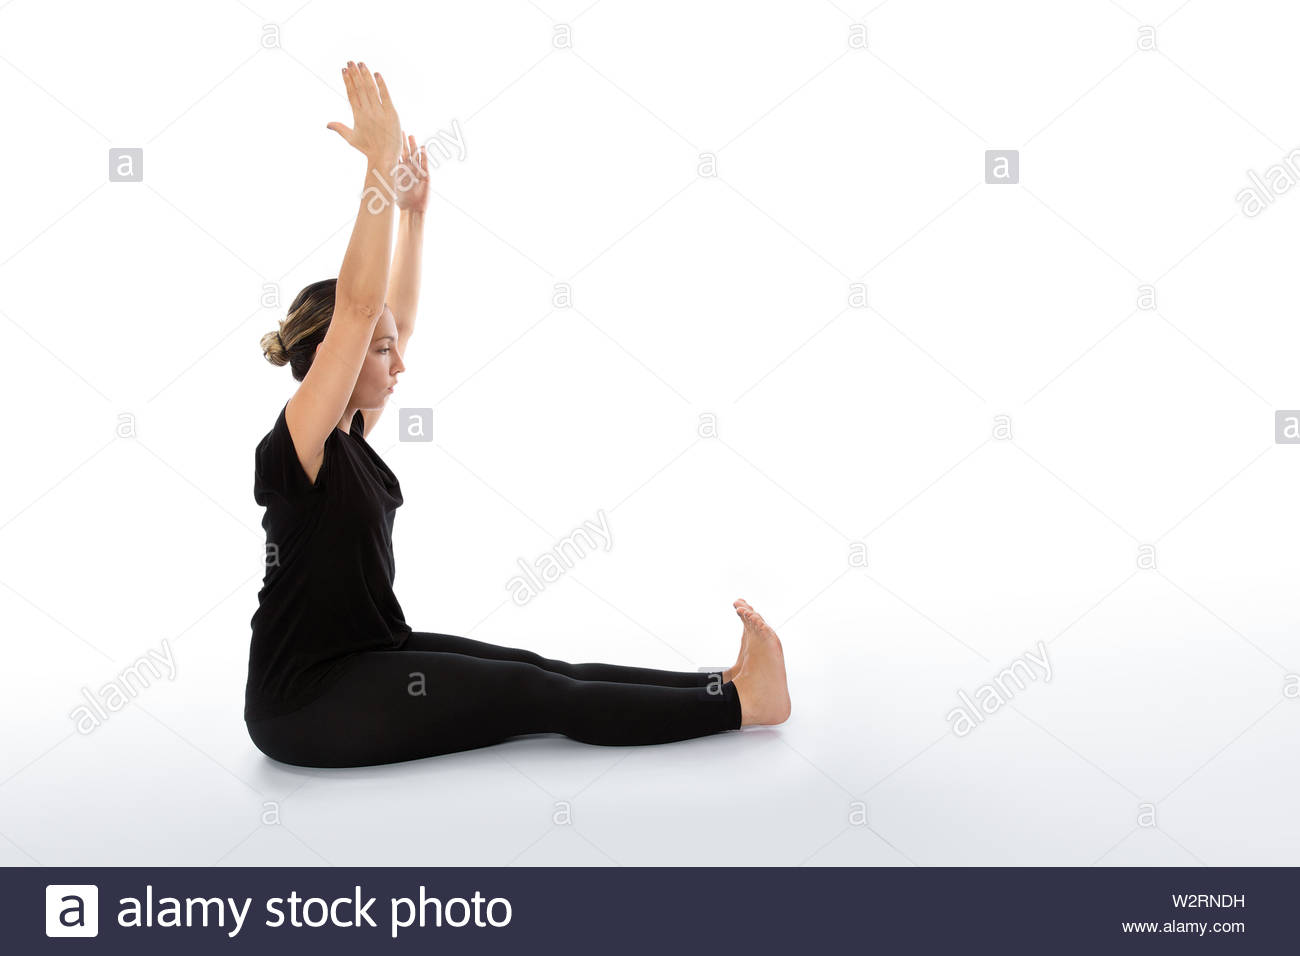 Yoga poses woman isolated with white background. Yoga pose set. Mindfulness and Spiritually concept. Girl practicing Hatha Yoga asanas. - Stock Image